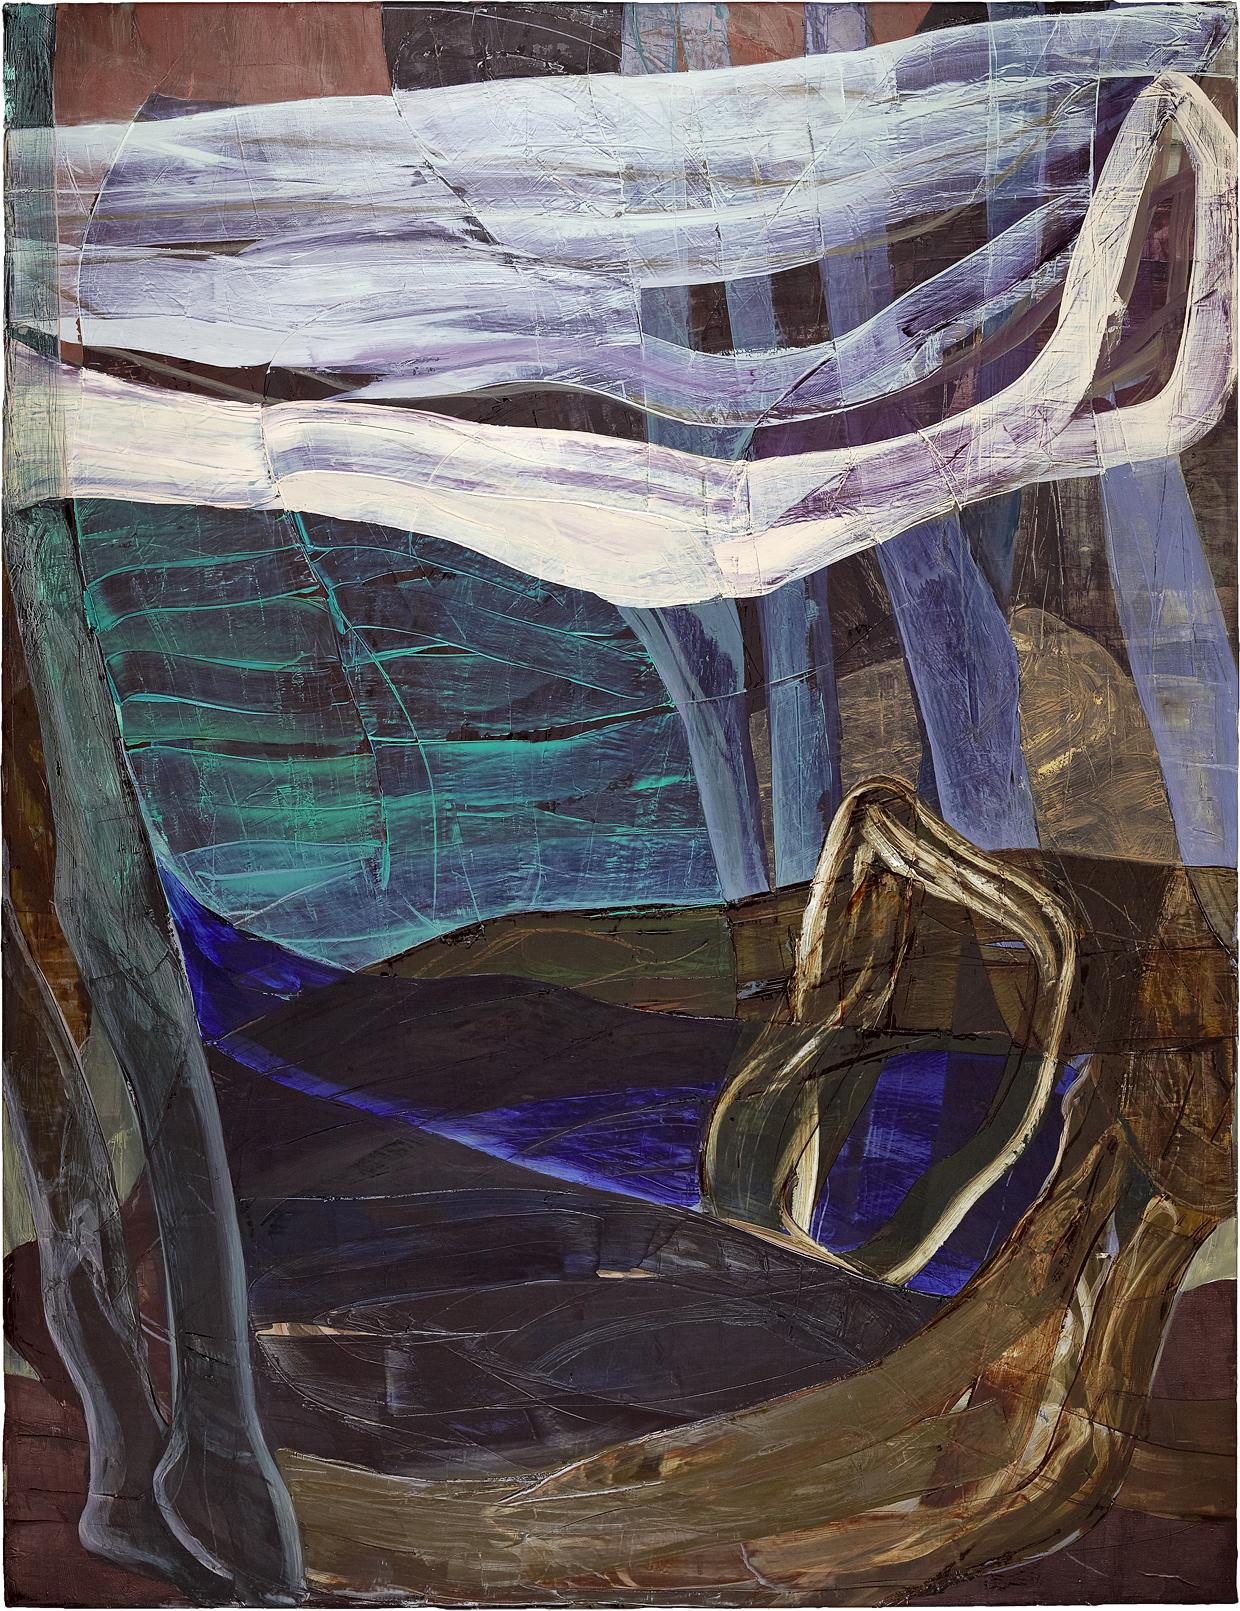 Lentos II, Öl auf Leinwand, 220 x 170 cm, 2010